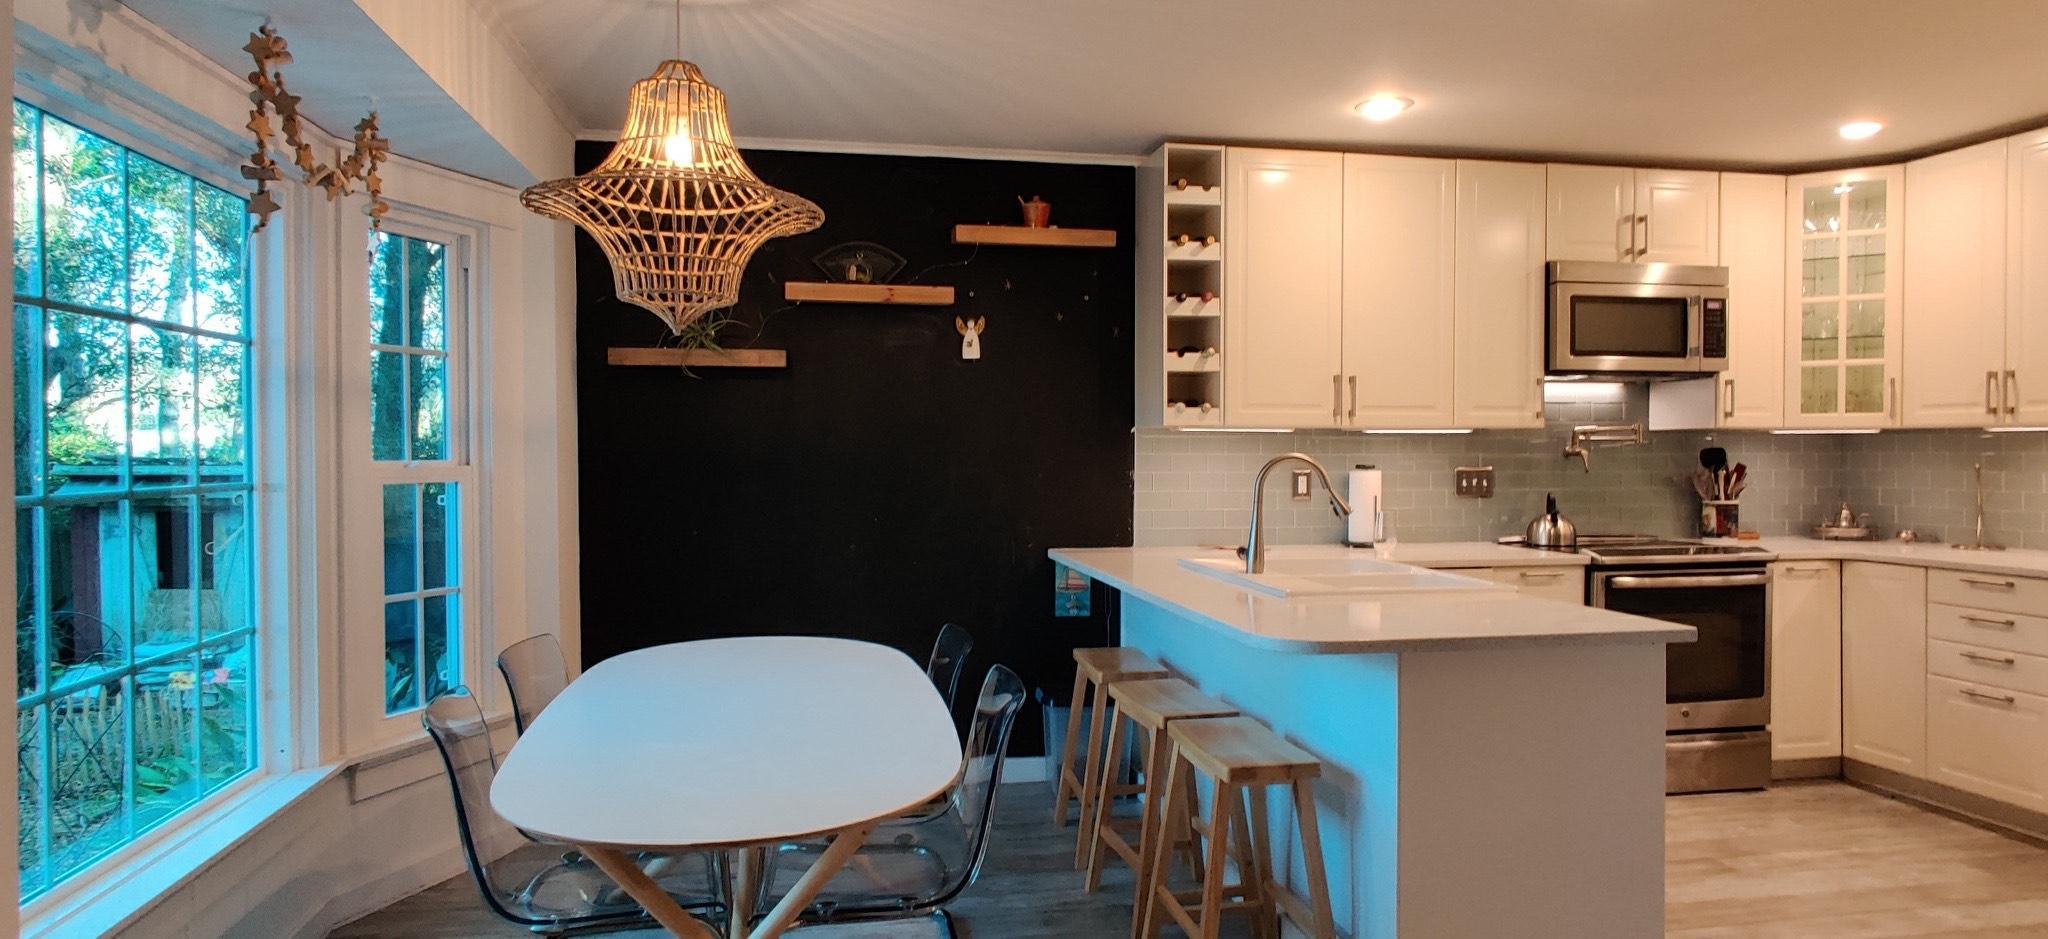 Shemwood II Homes For Sale - 950 Sea Gull, Mount Pleasant, SC - 14